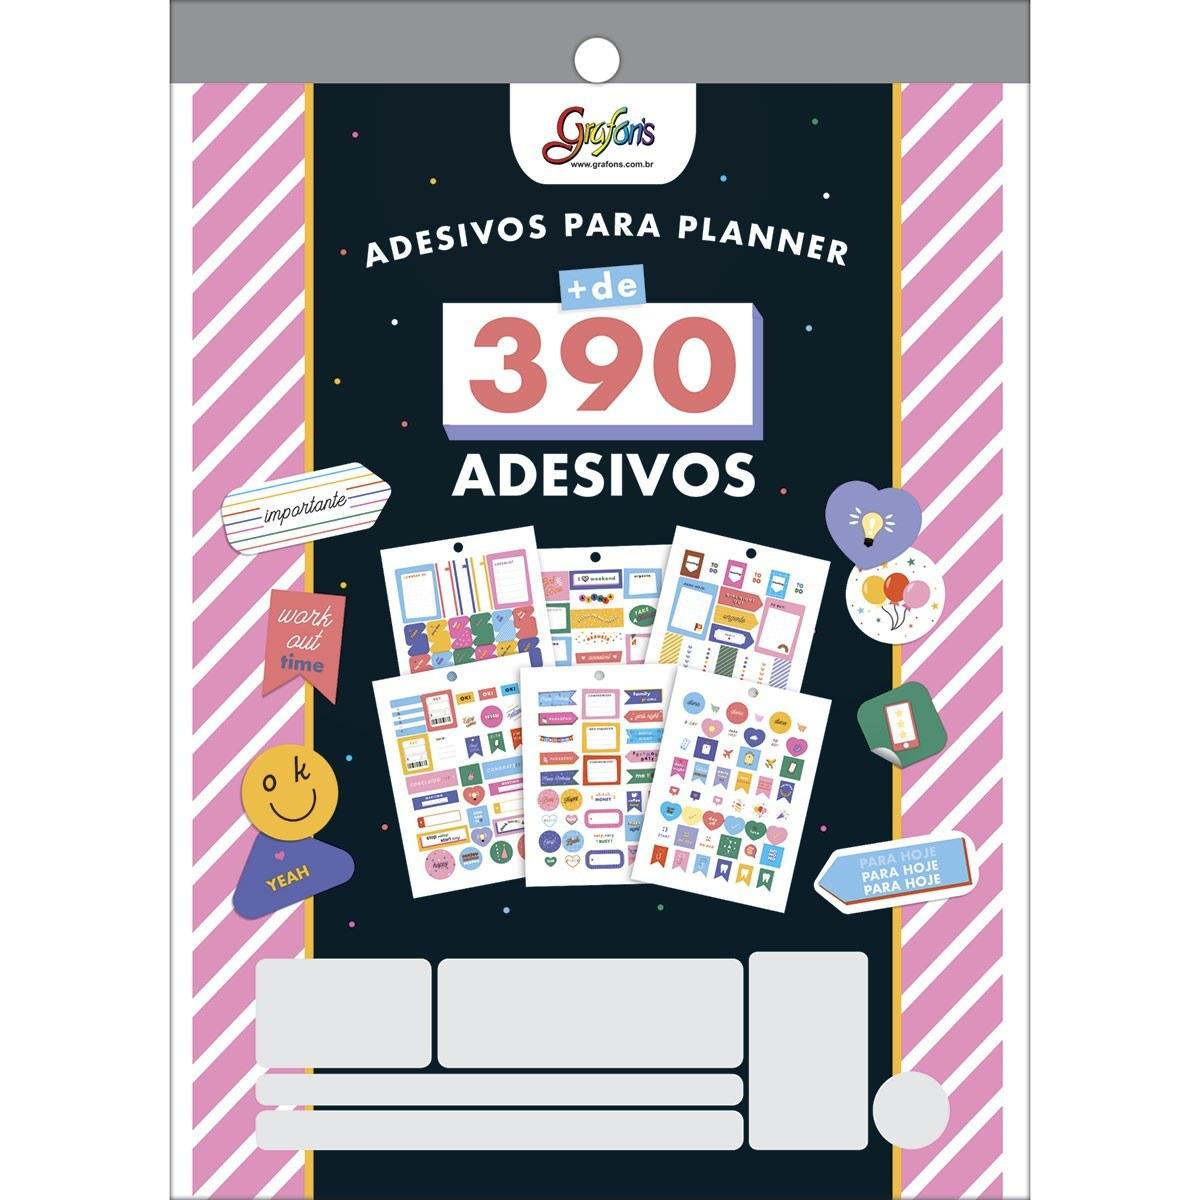 Bloco Adesivos para Planner Grafon´s 12 Fls - Tilibra